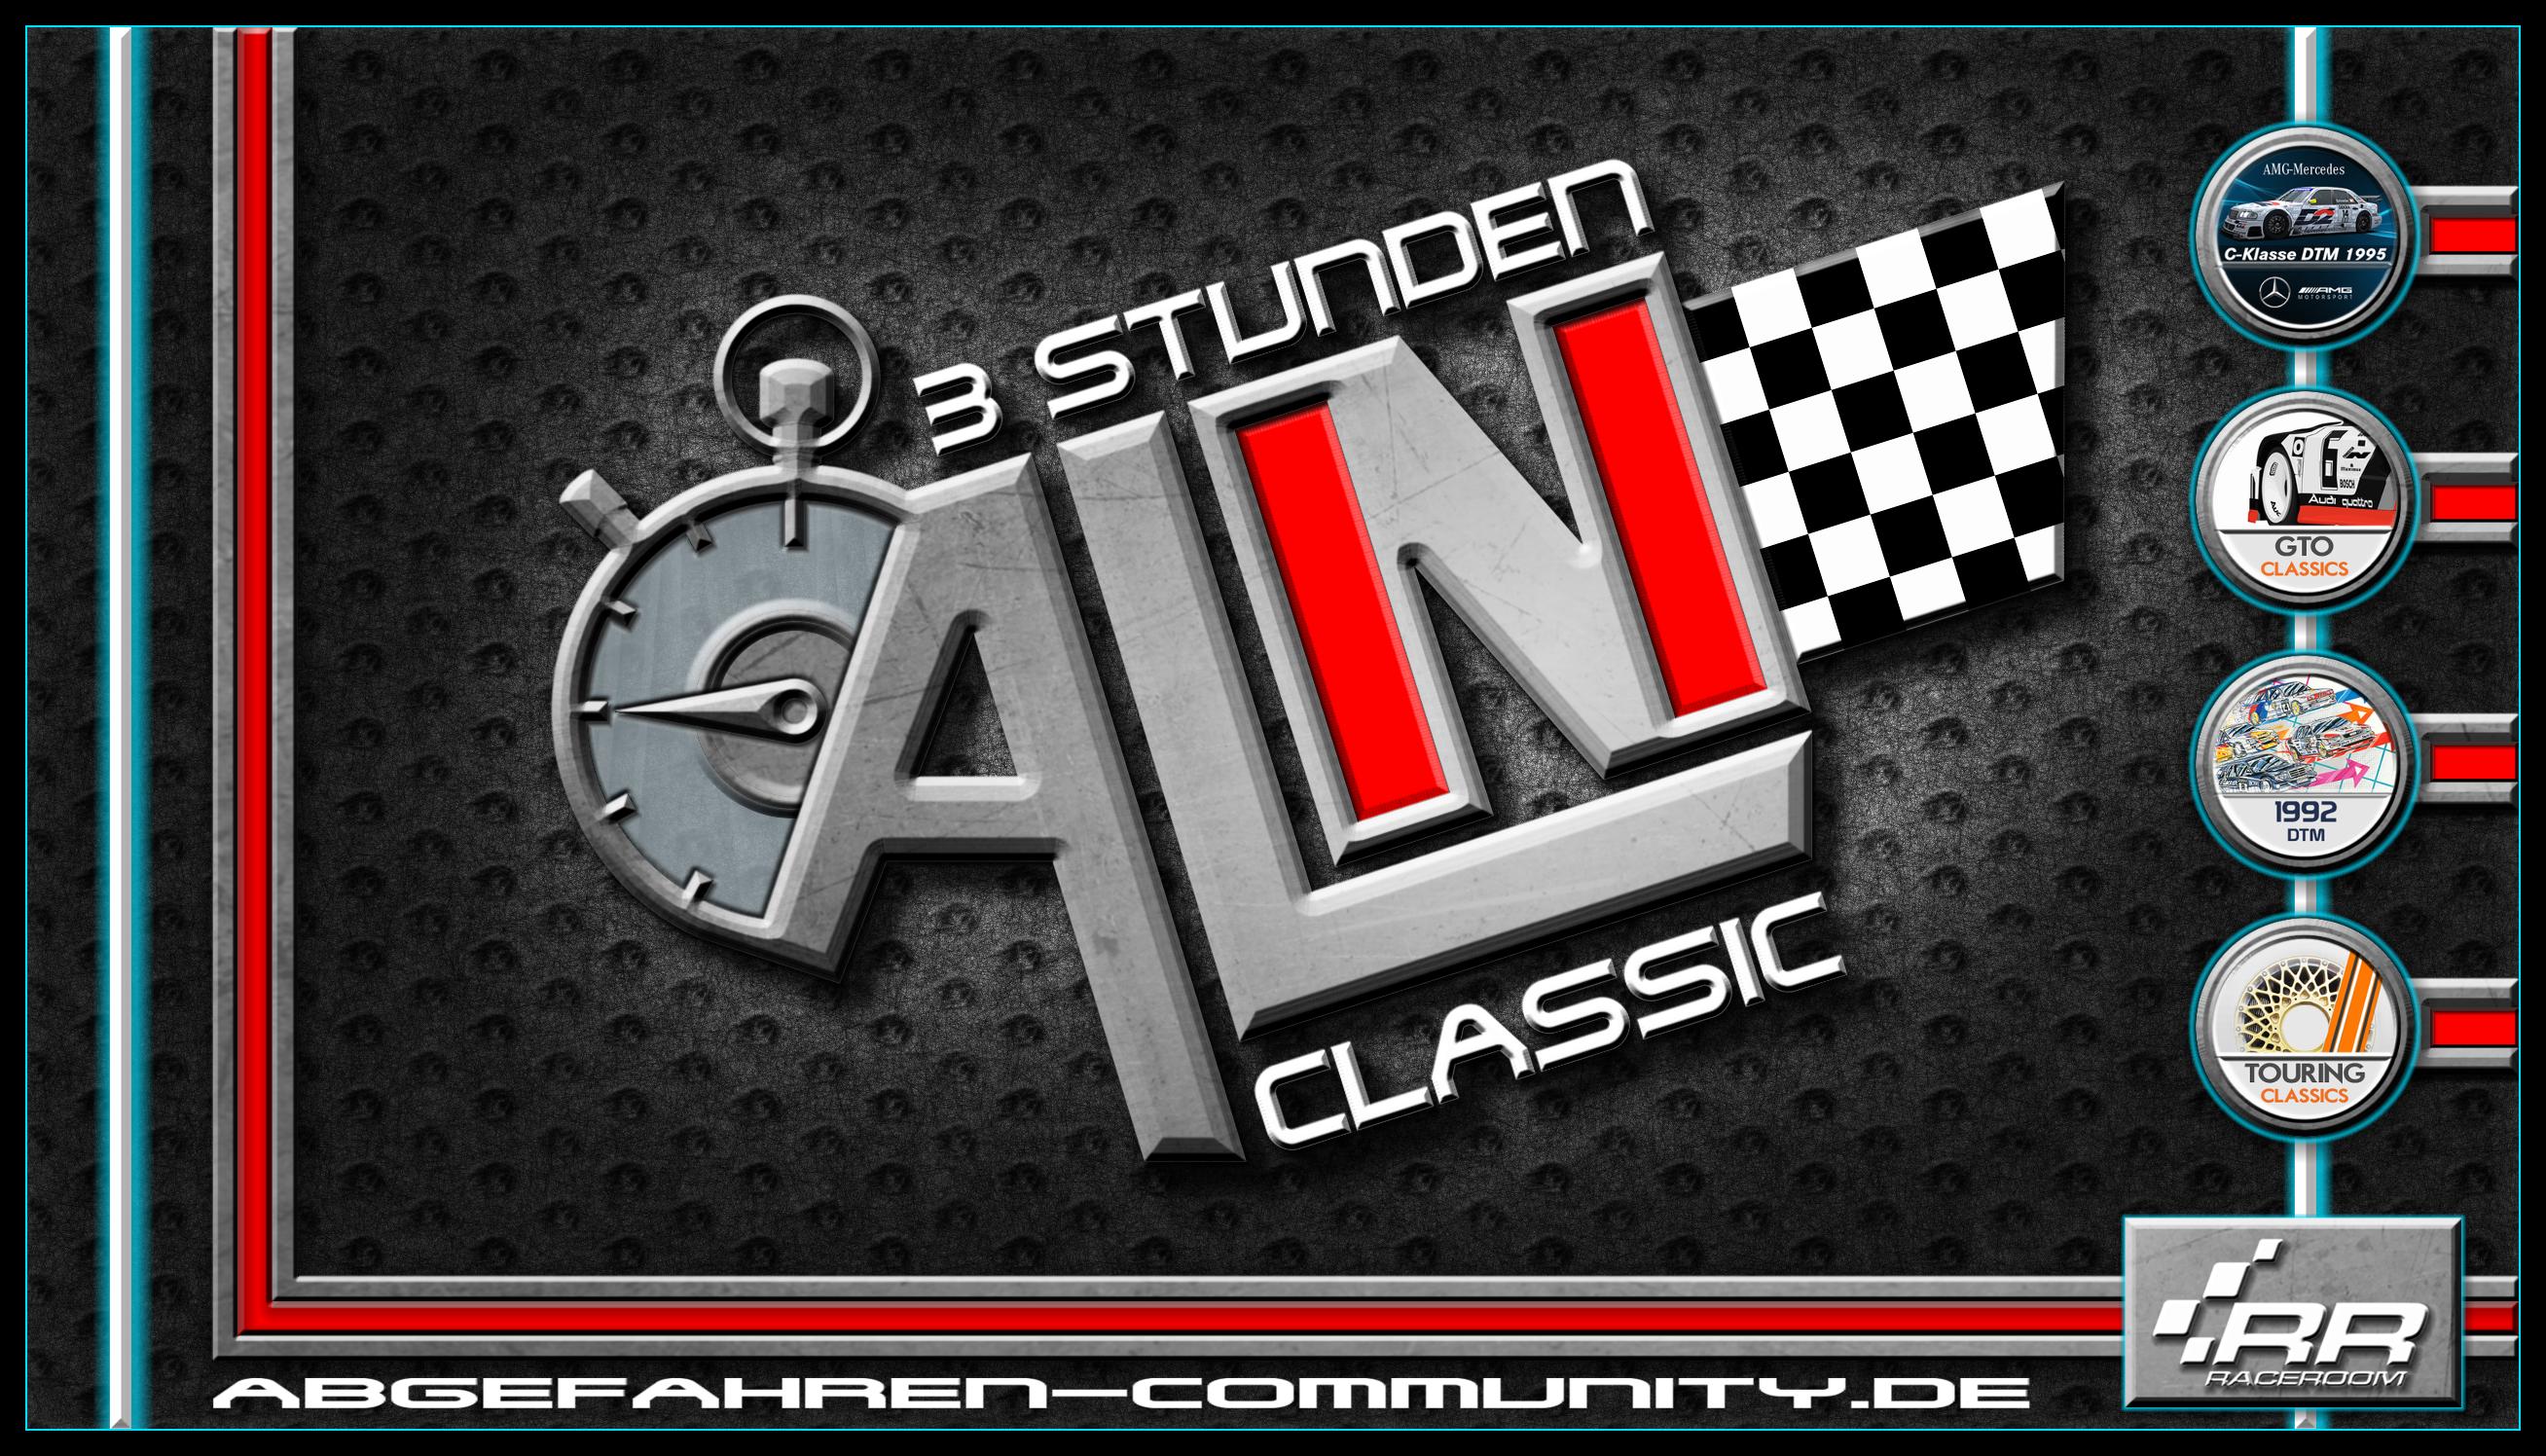 R3E - Anmeldung ALN-CLASSIC